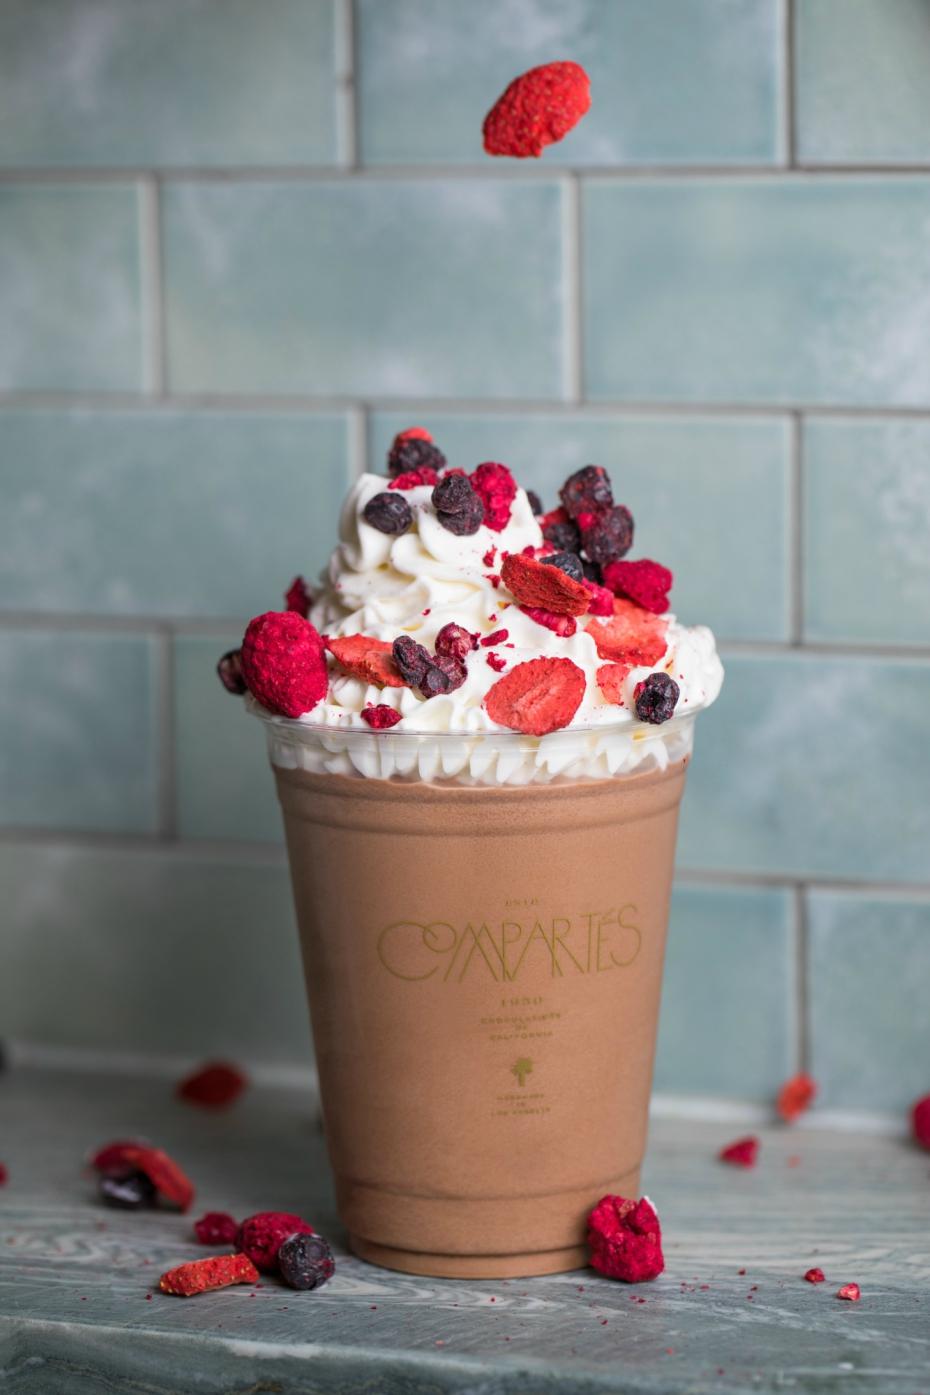 compartes-frozen-hot-chocolate-091917